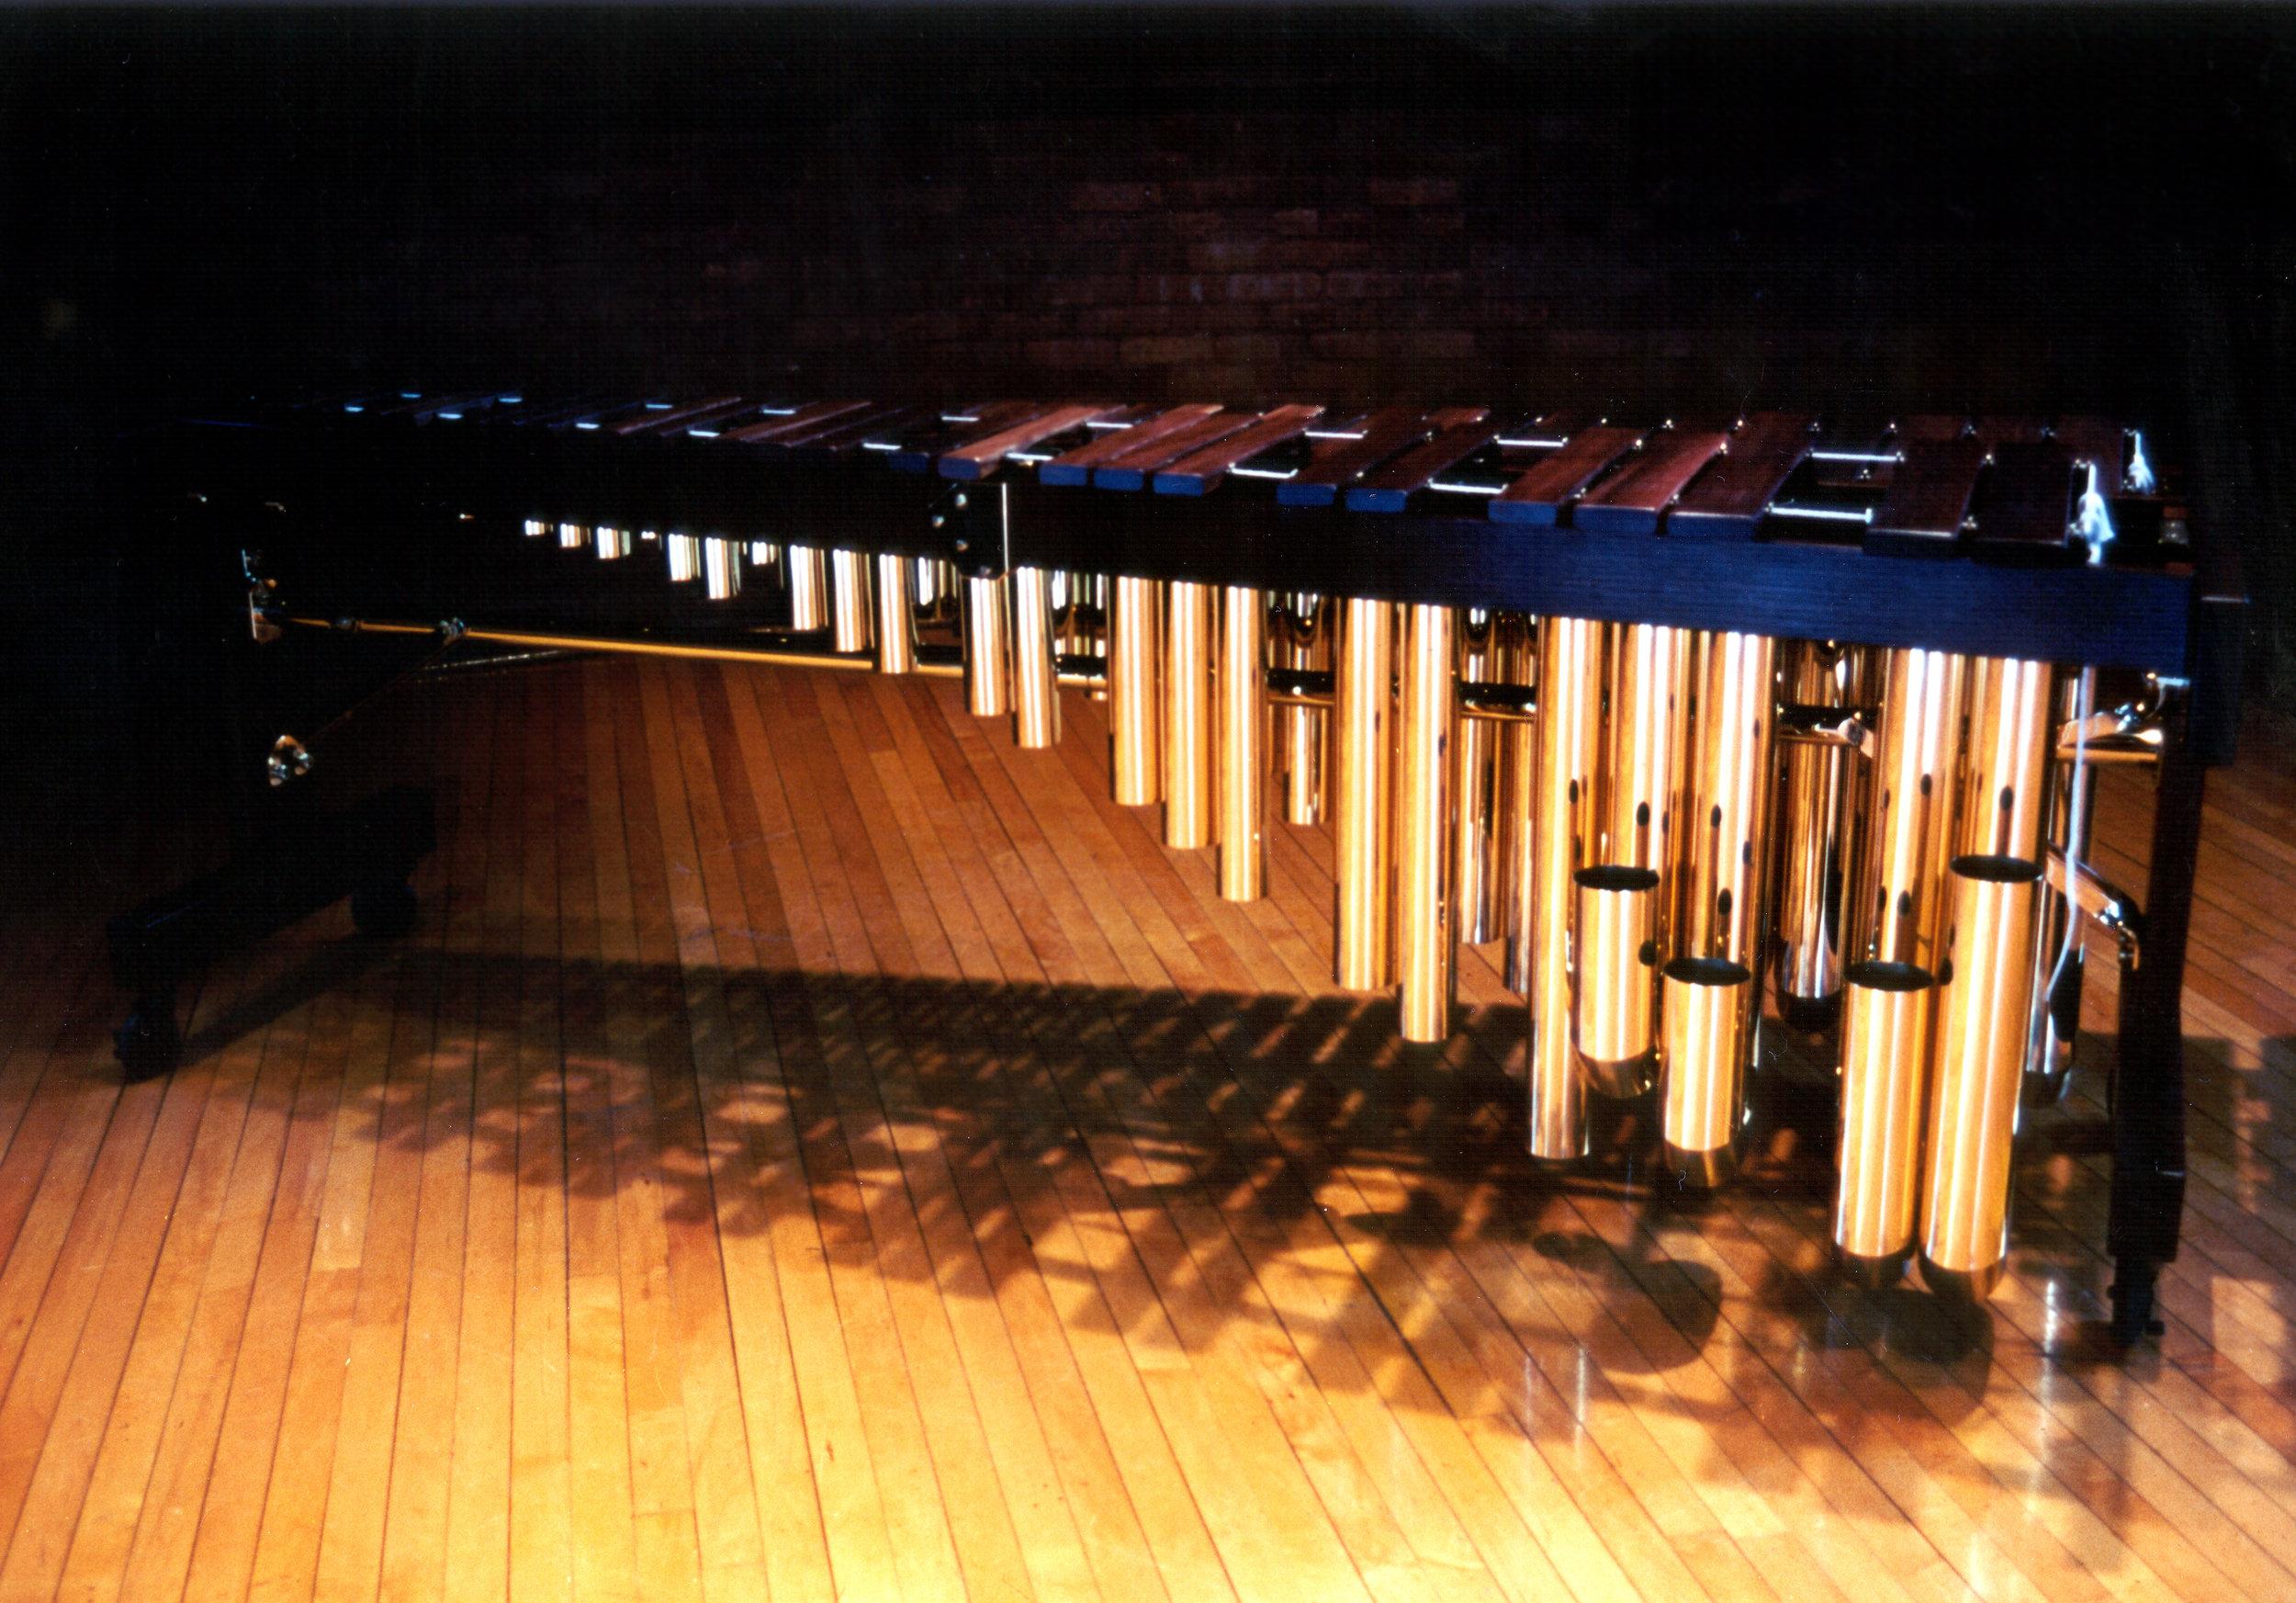 Robert Paterson's 5 Octave Marimba by Douglas DeMorrow.